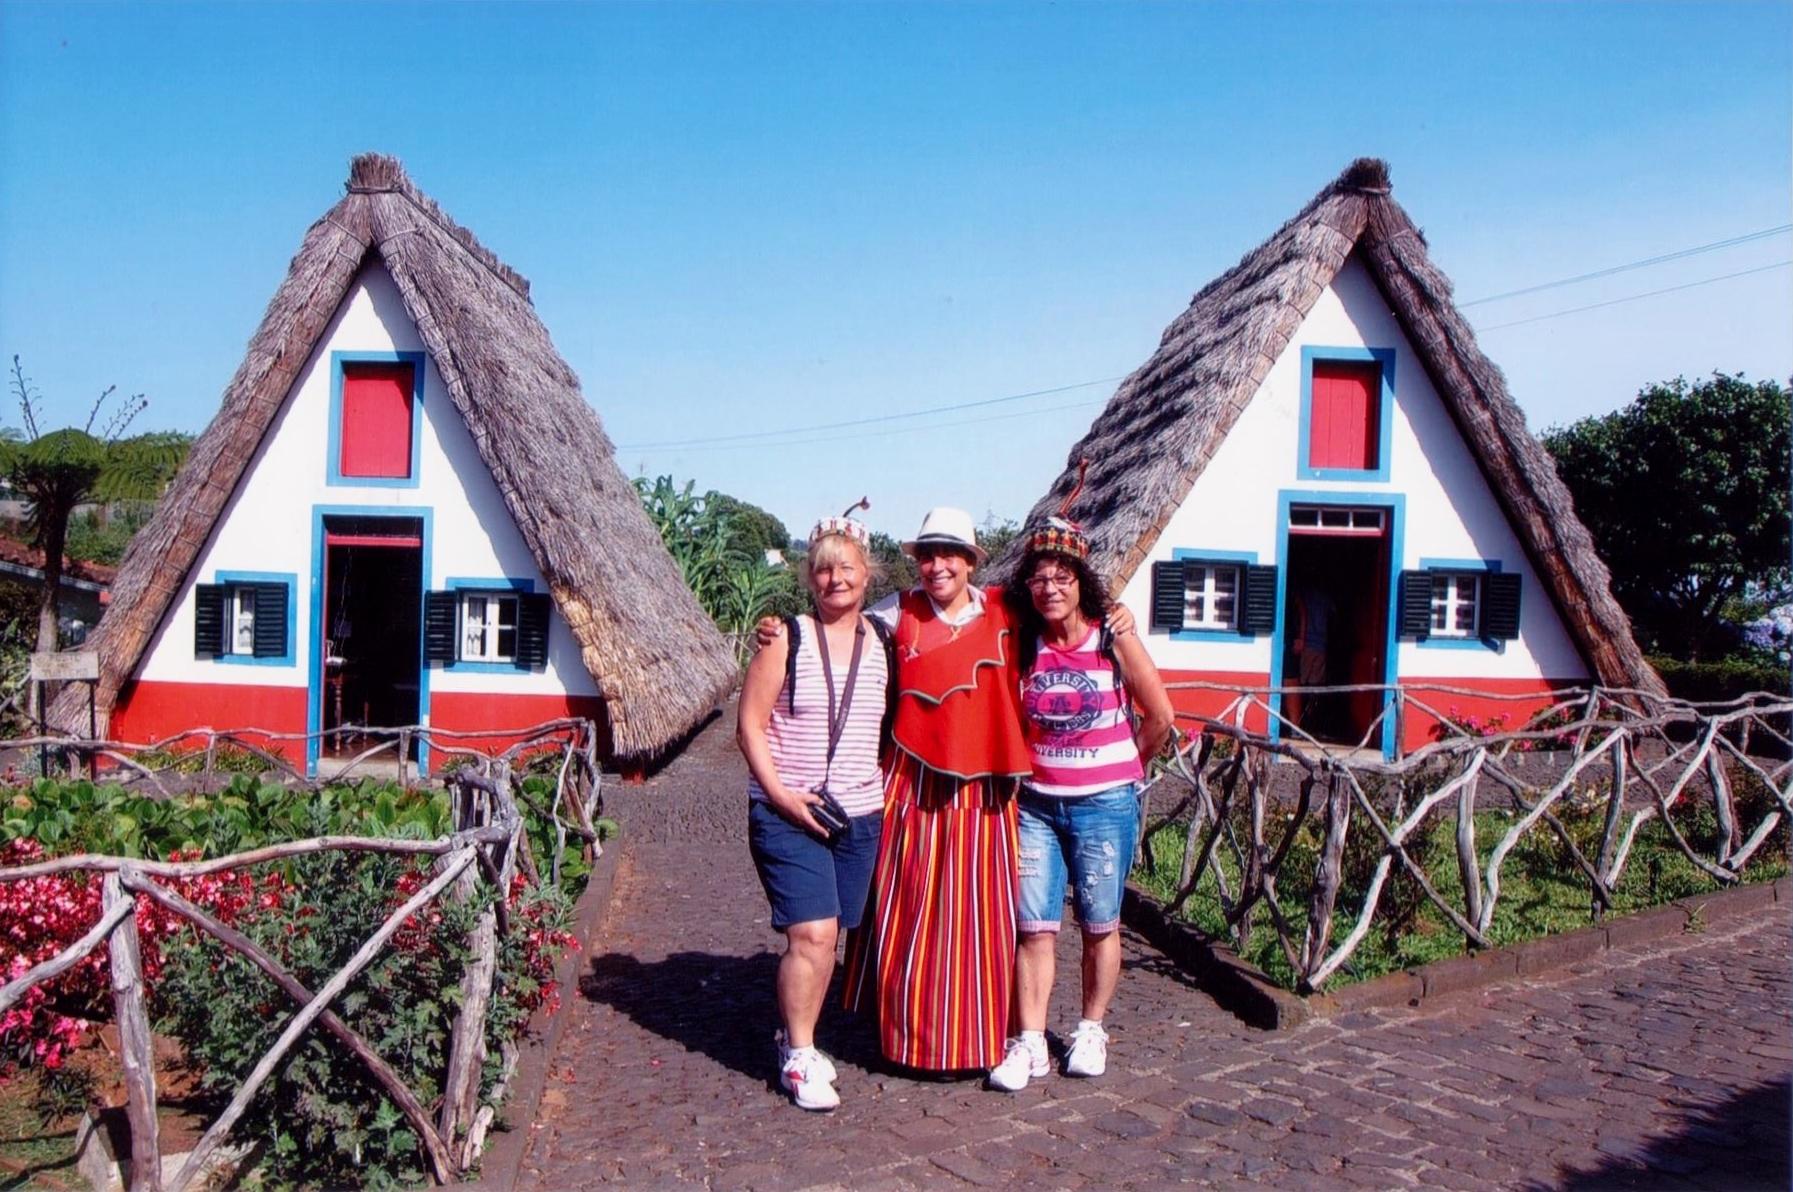 Merche y Valen posan en Madeira con sus típicas casas triangulares.